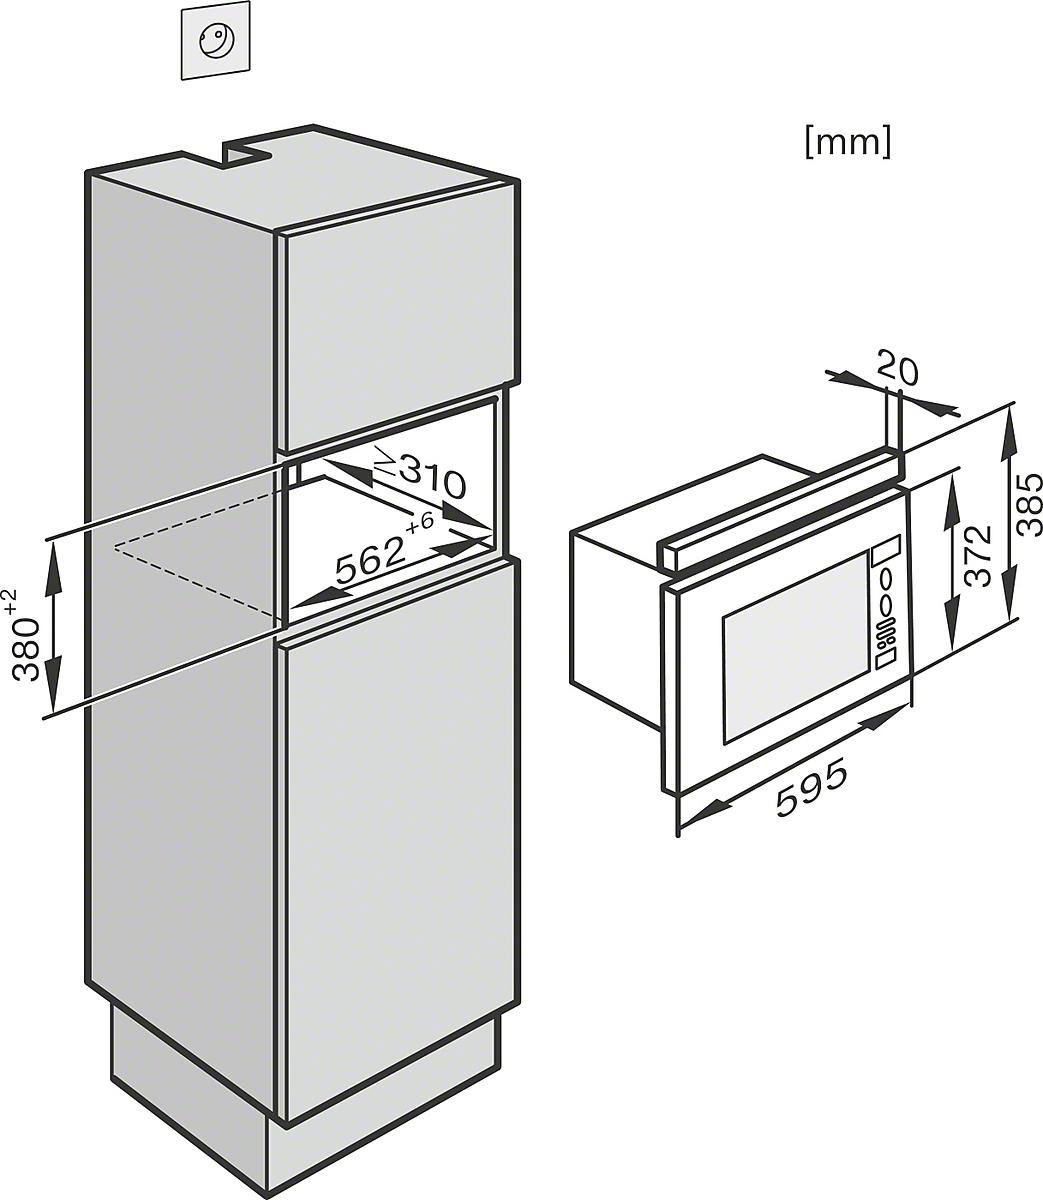 miele m 6030 sc einbau mikrowellenger t. Black Bedroom Furniture Sets. Home Design Ideas